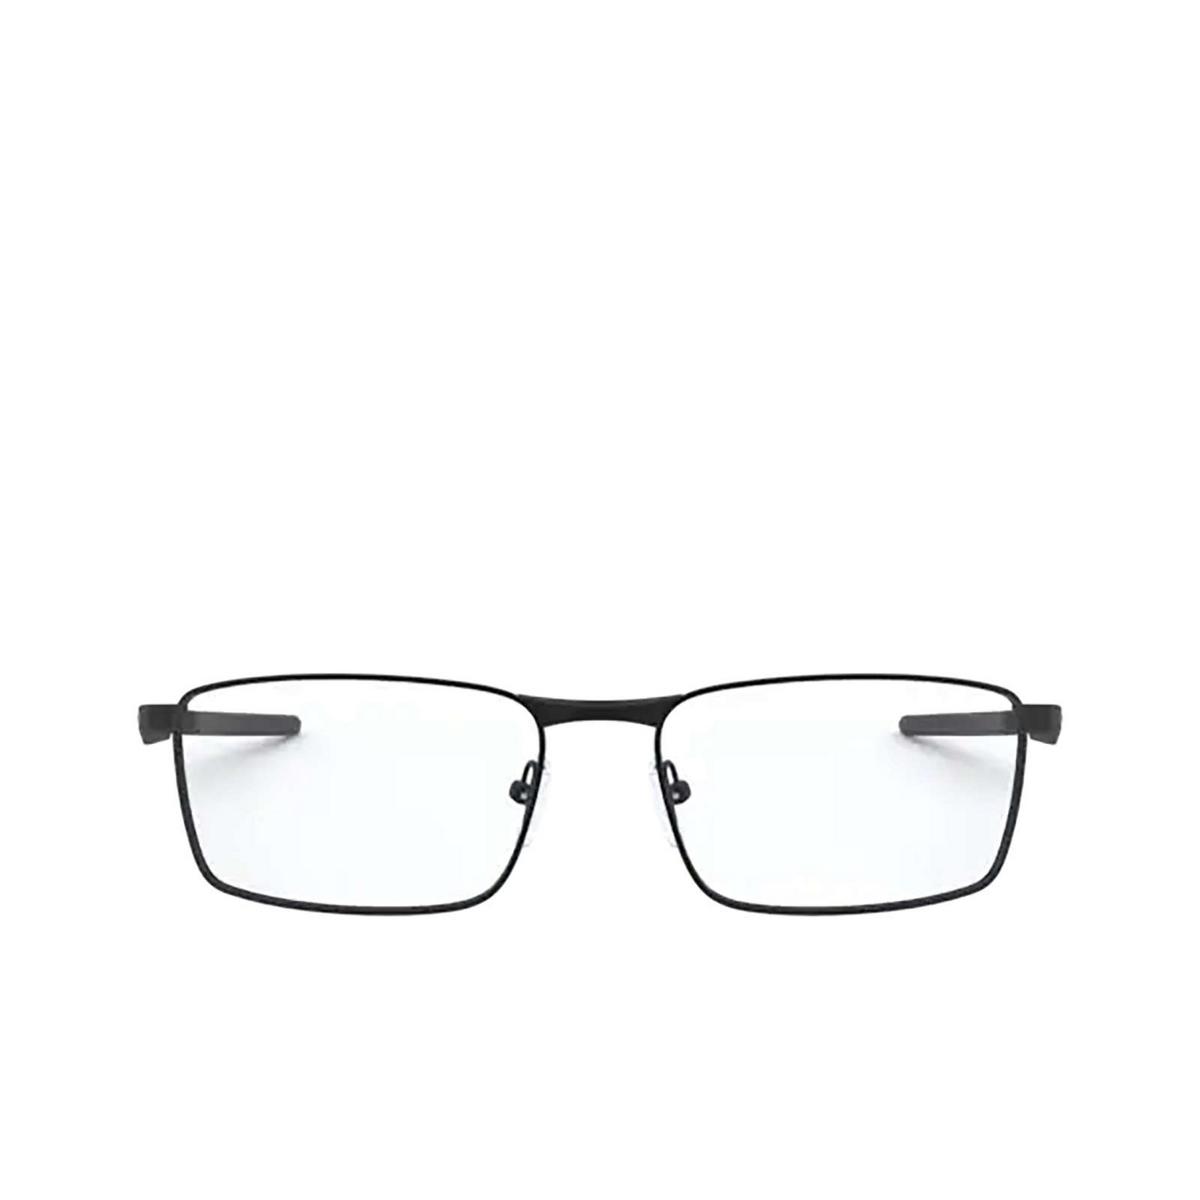 Oakley® Rectangle Eyeglasses: Fuller OX3227 color Satin Black 322701 - front view.